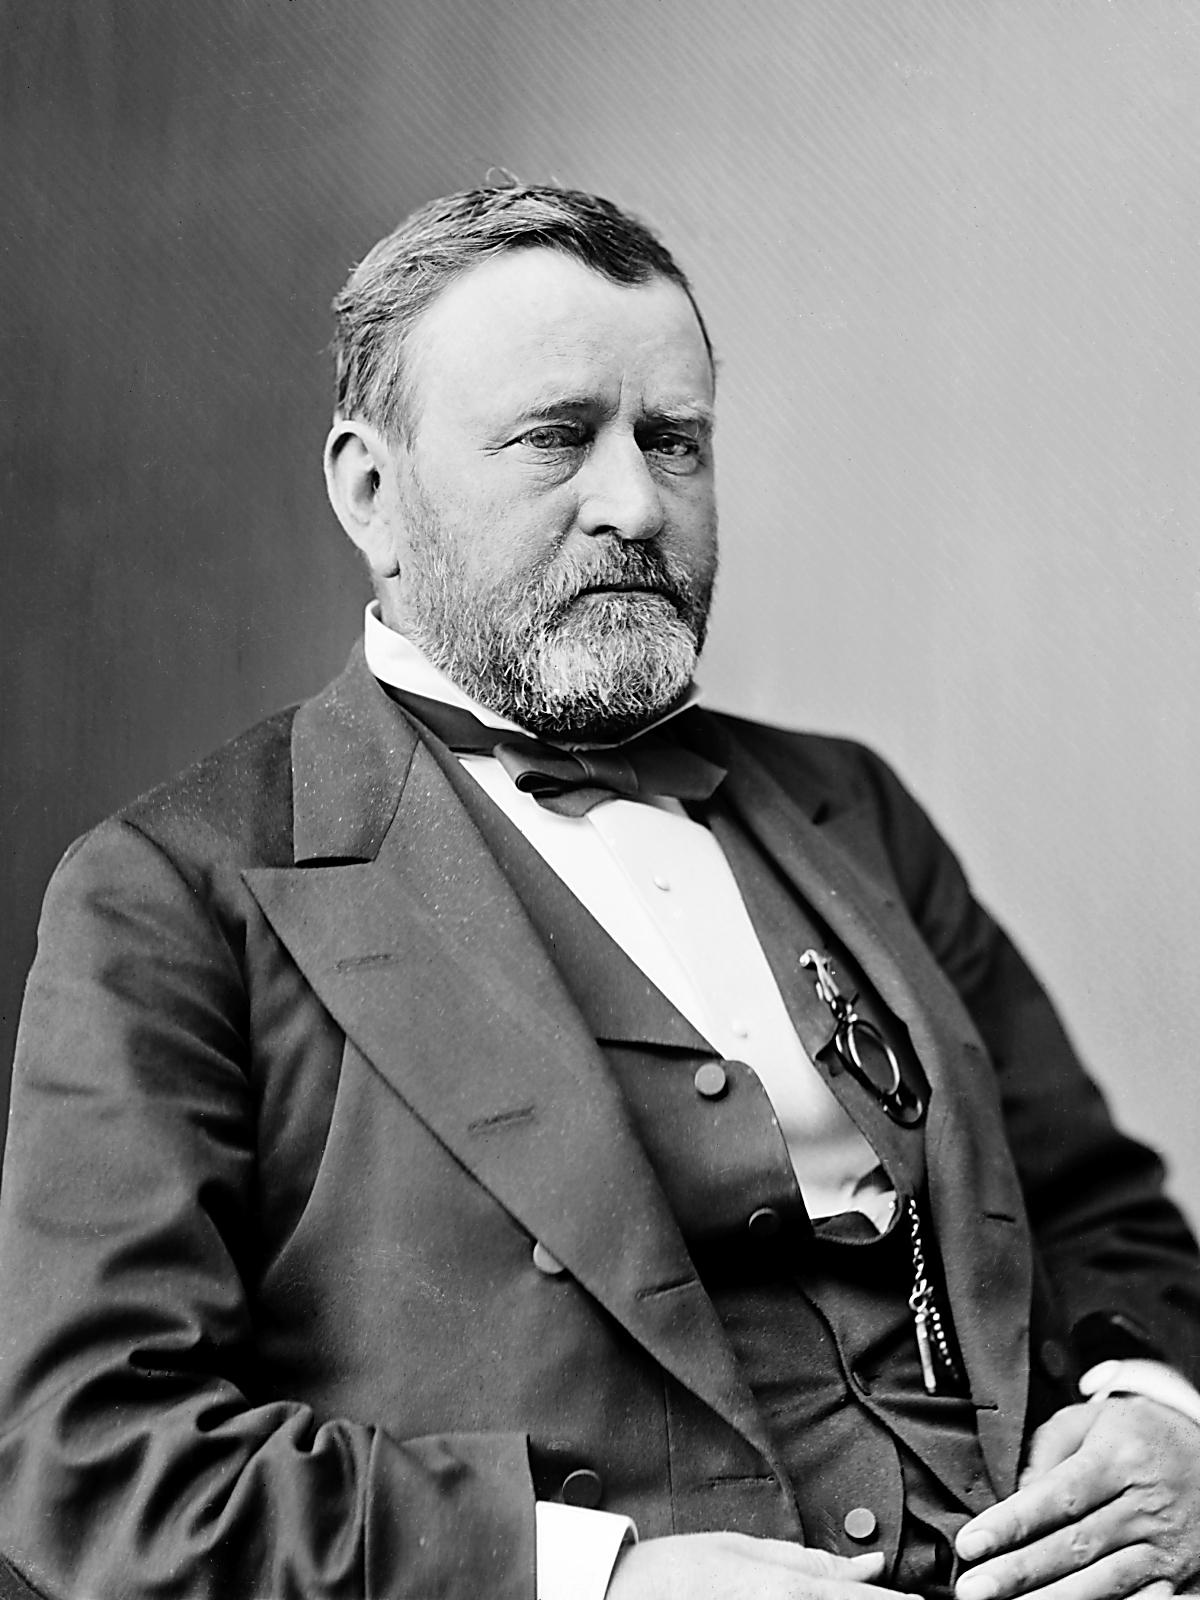 Ulysses grant photo